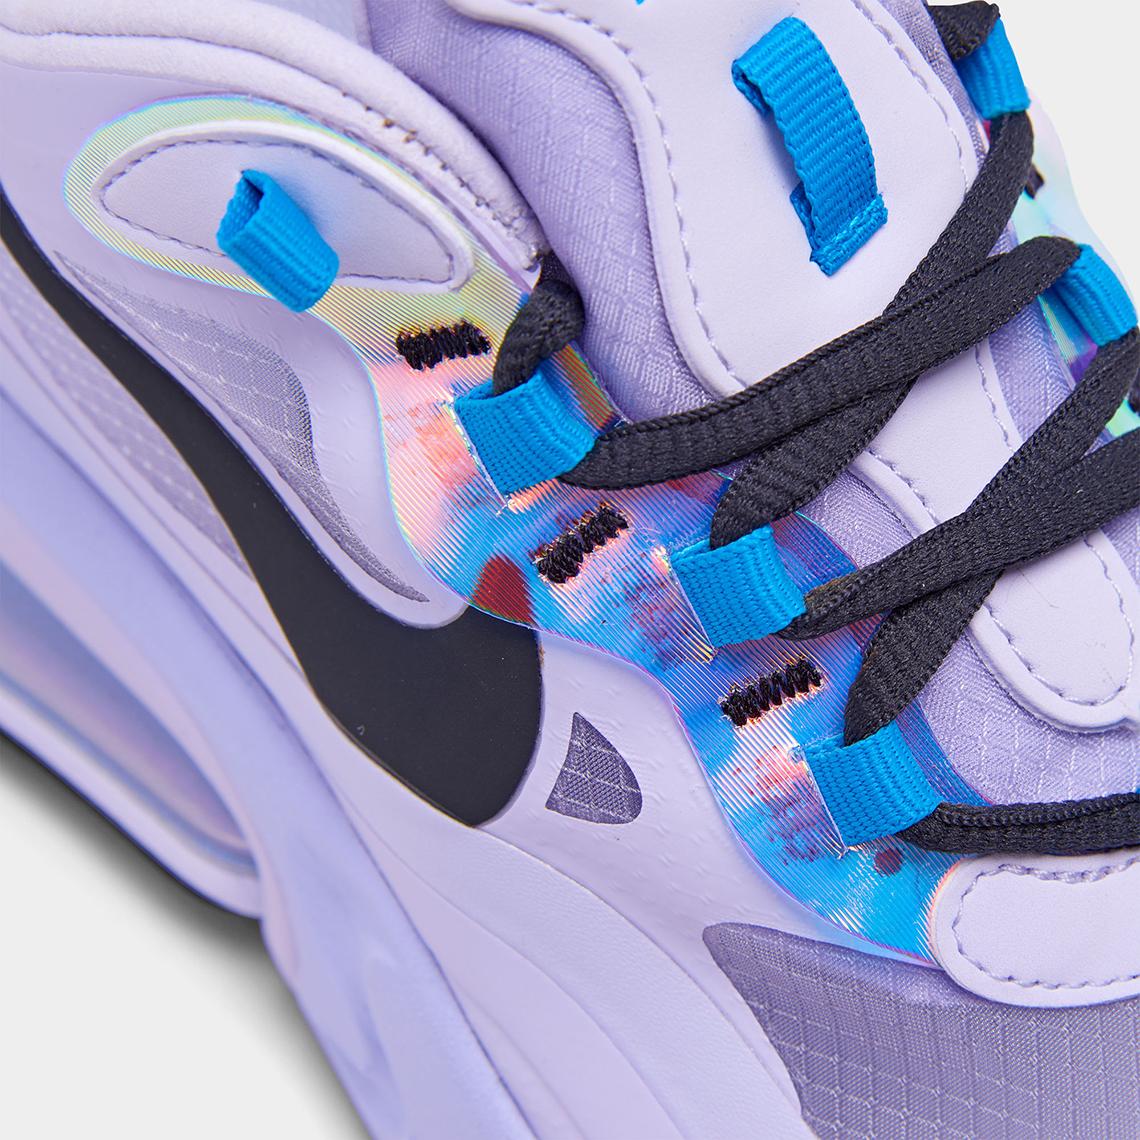 Nike Air Max 270 React Amethyst Blue CT1613 500